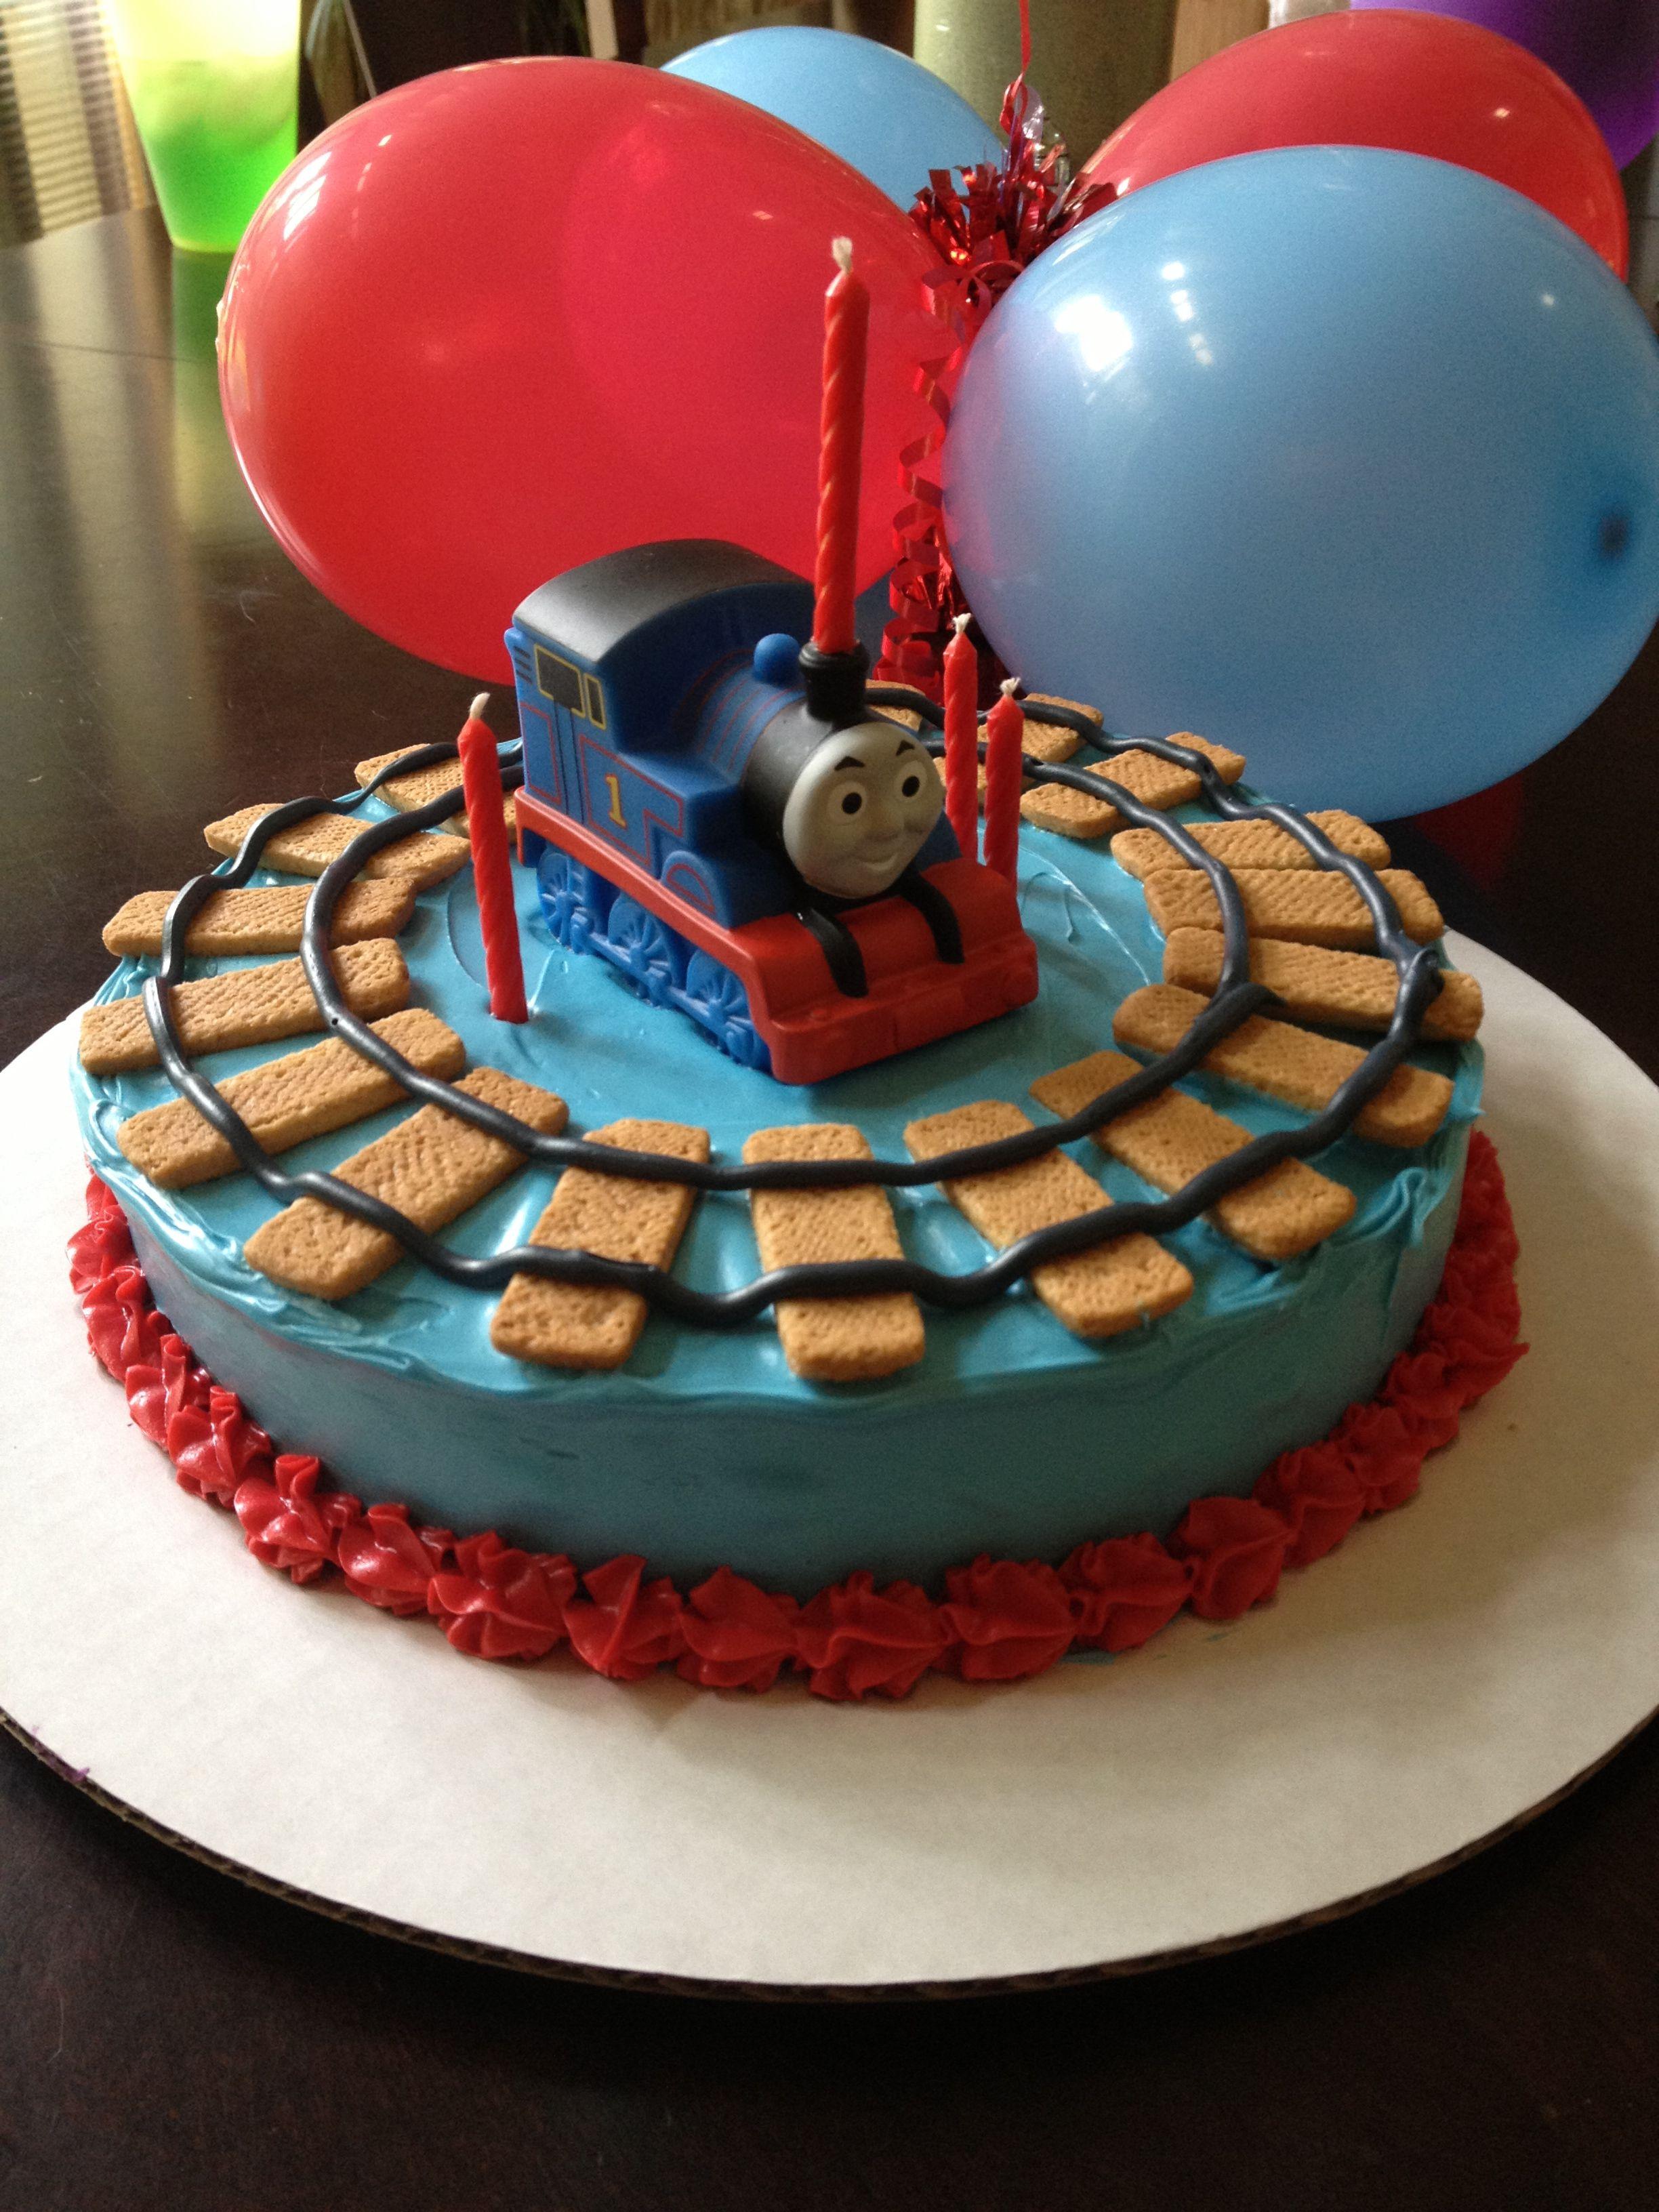 Thomas the Train birthday cake I usually shy away from a character